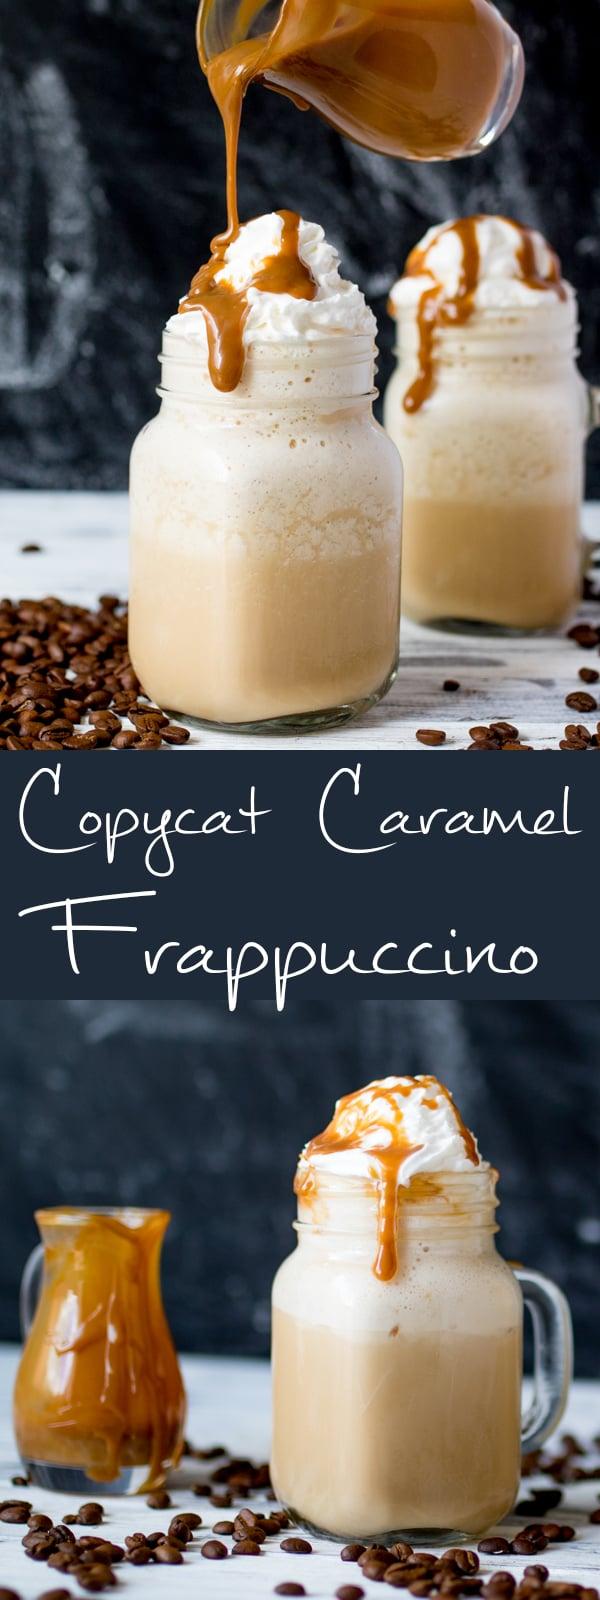 starbucks caramel frappuccino copycat pin